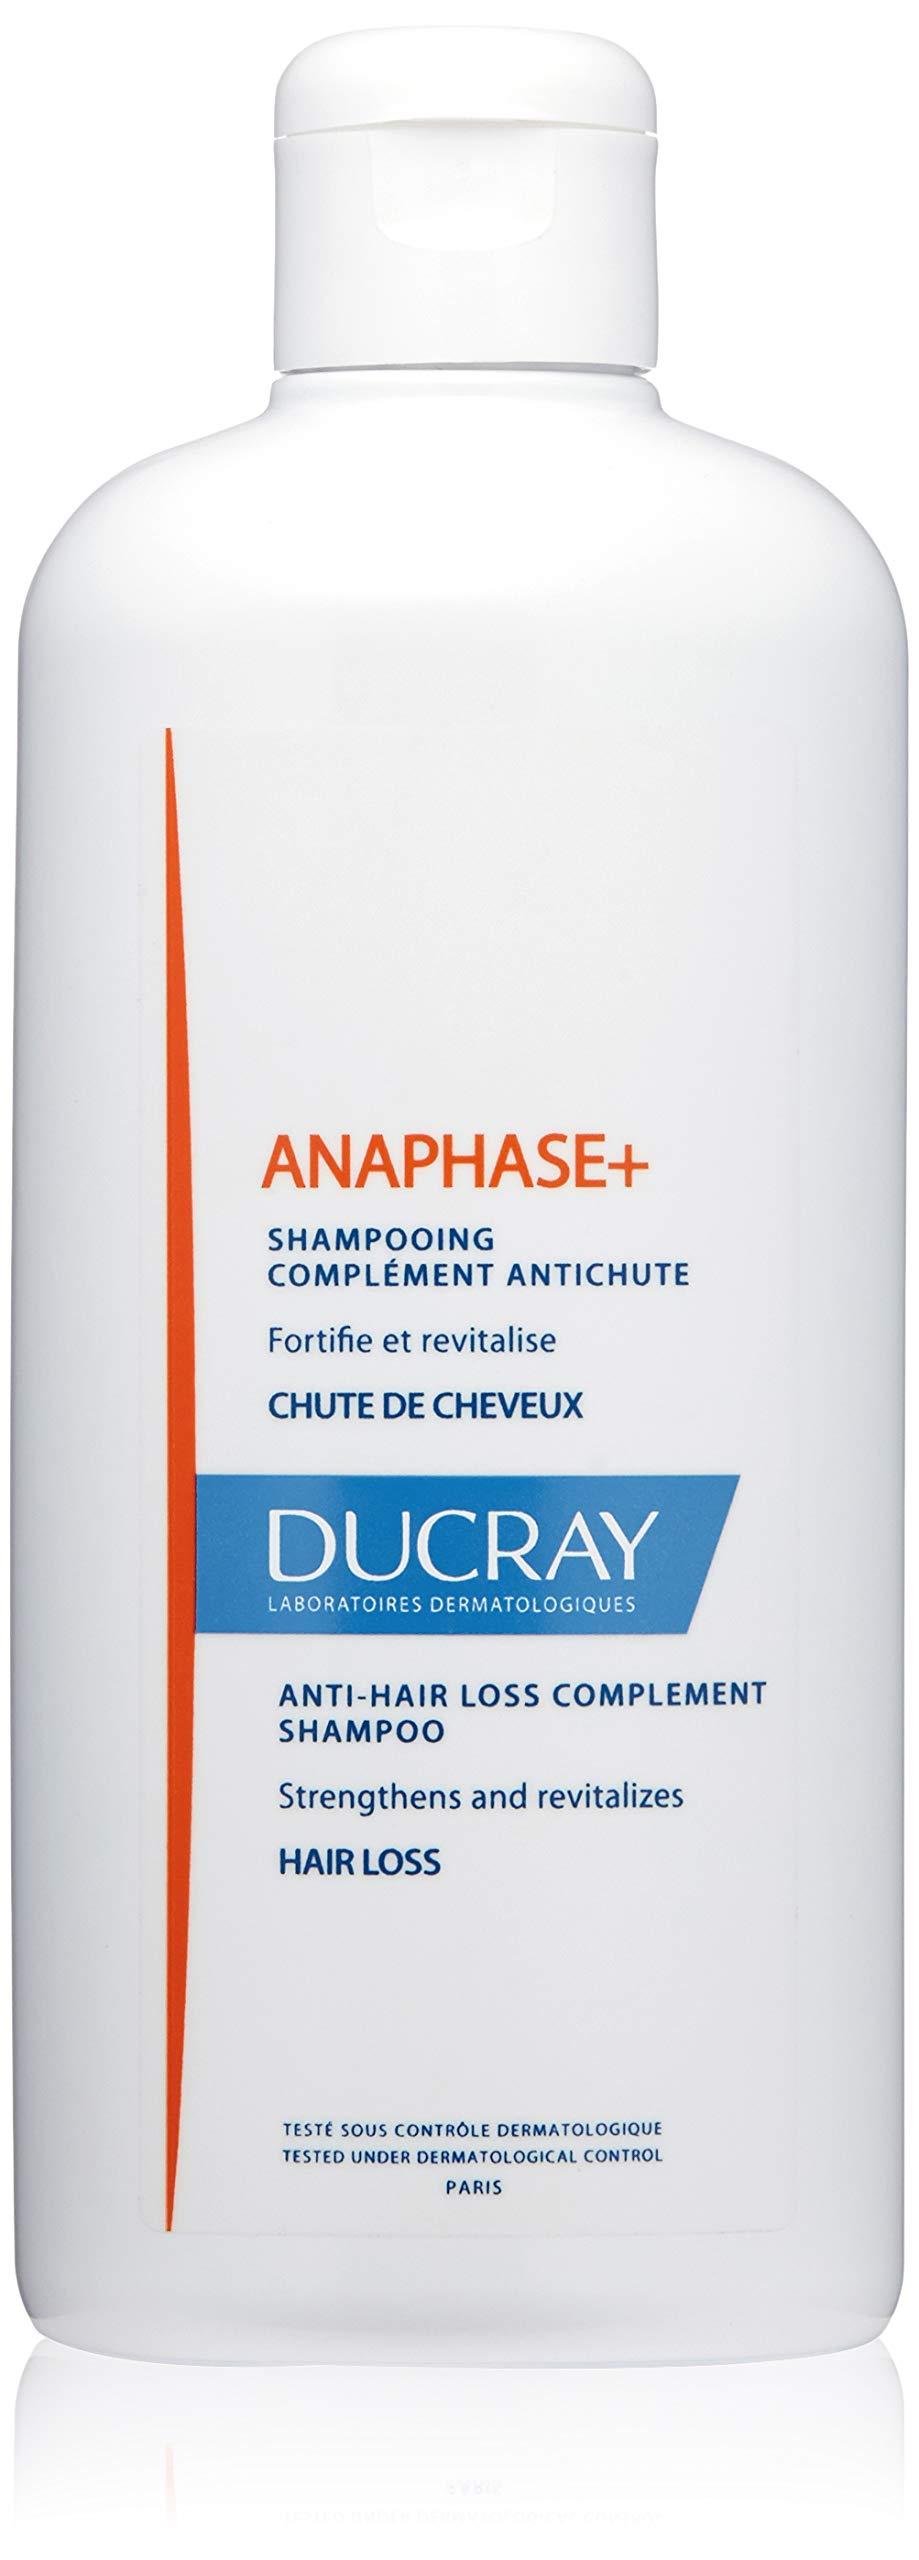 Ducray Anaphase+  Shampoo, Ruscus & Biotin, Thinning, Weak, Fine Hair, 13.5 oz. by Ducray